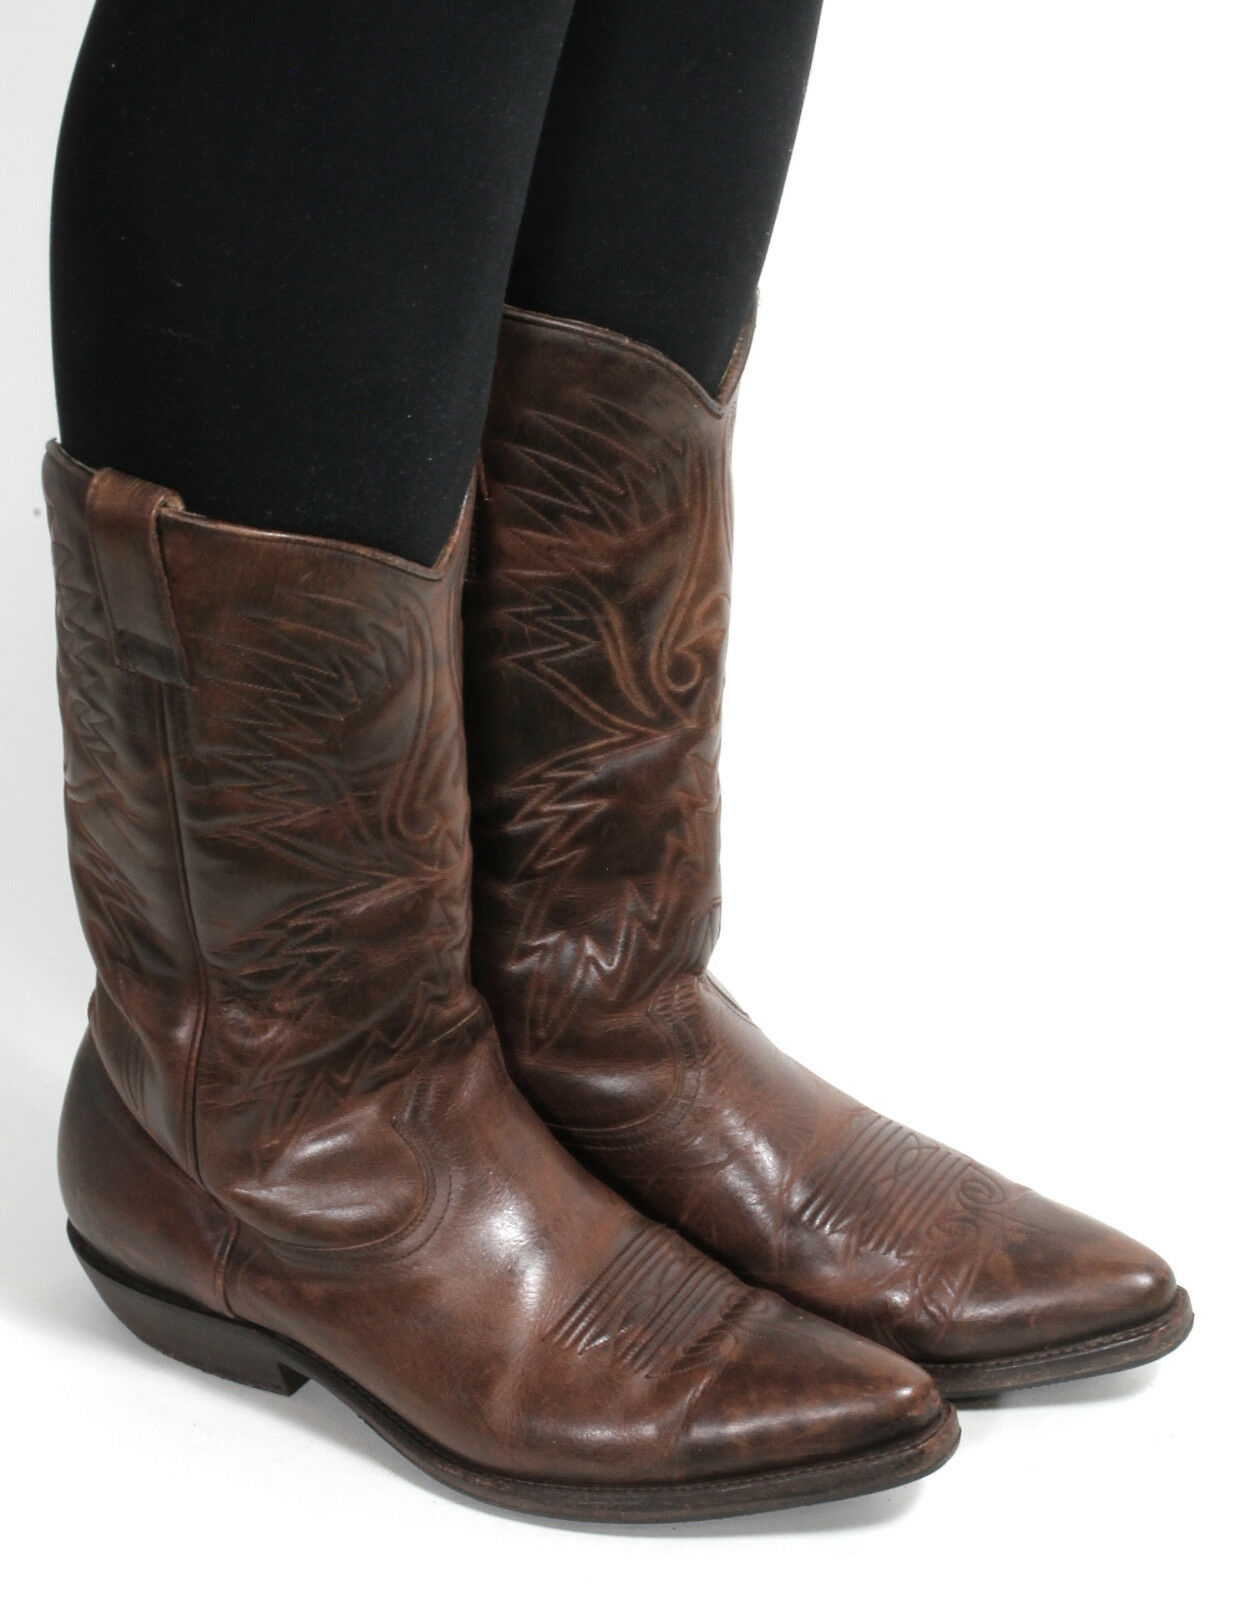 Stivali Western Cowboy Stivali Catalan Style line dance Texas stivali Don Quijote 38